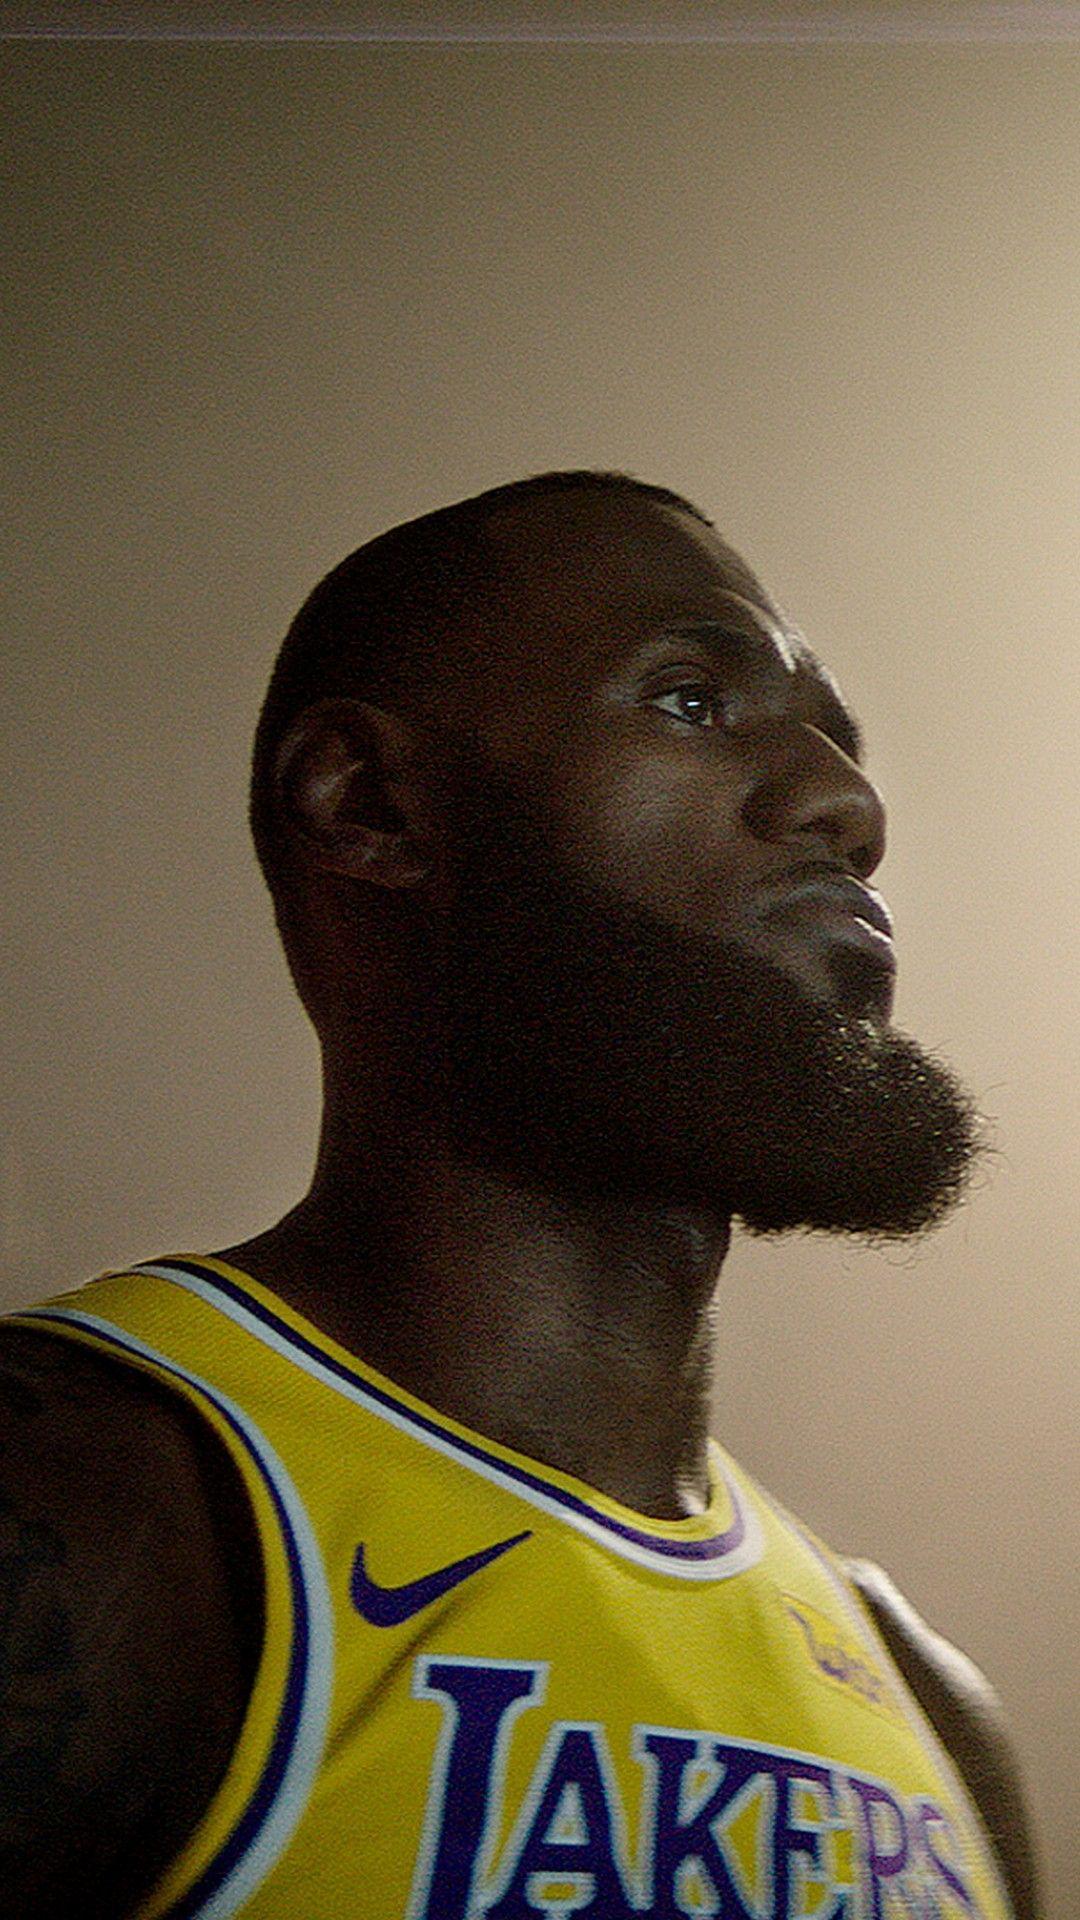 LeBron James LA Lakers iPhone 7 Plus Wallpaper Iphone 7